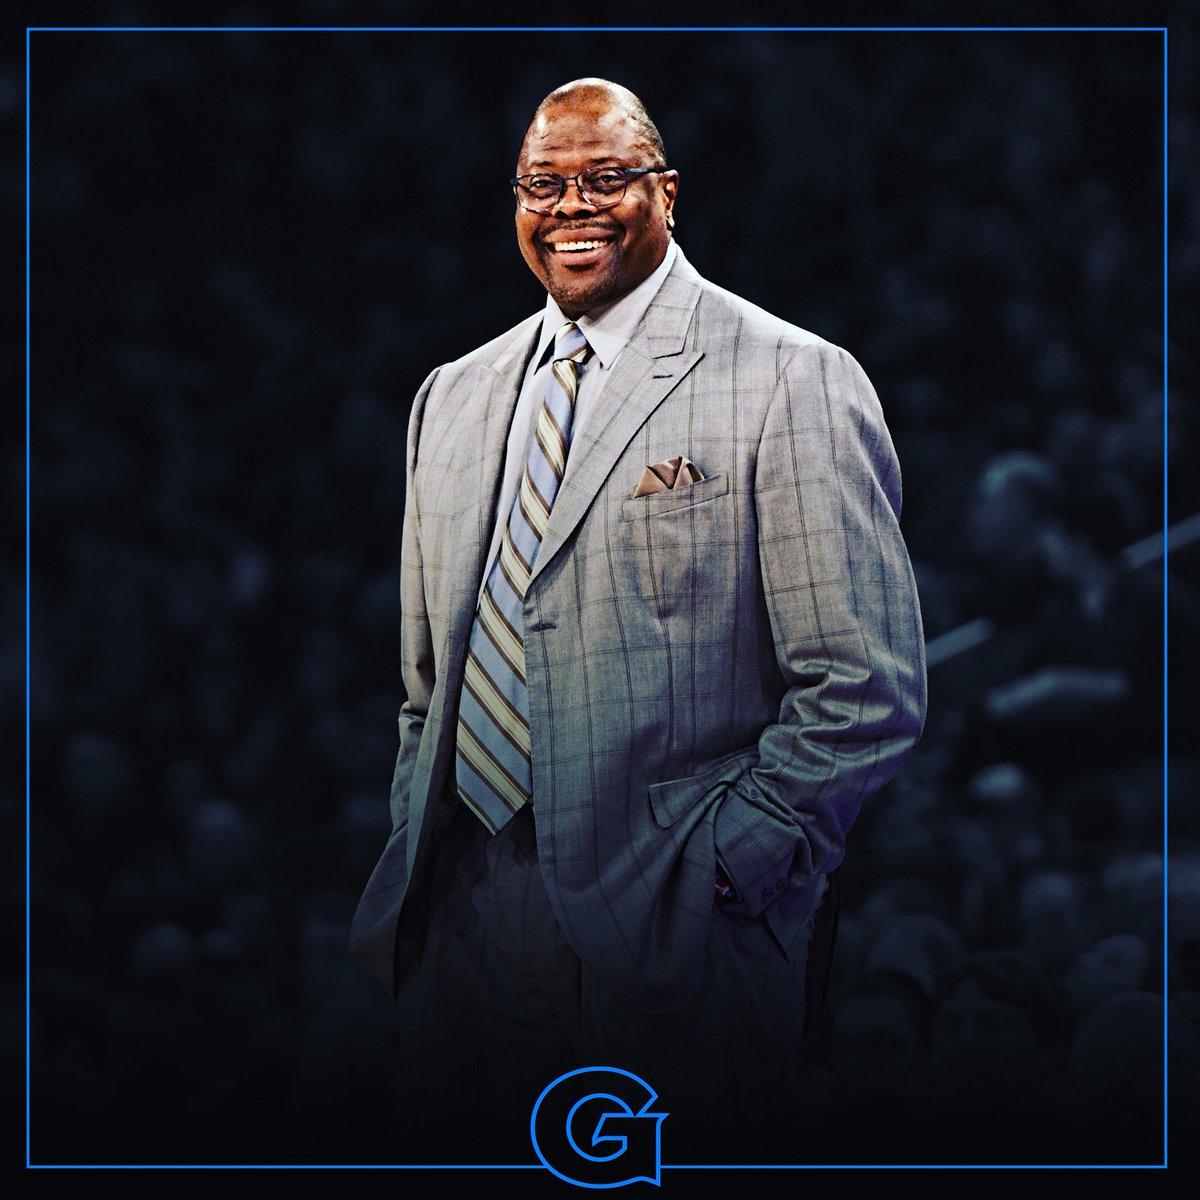 RT @GeorgetownHoops: Happy Birthday, Coach! 🎉🎂 #H4L #hoyasaxa @CoachEwing33 https://t.co/VJHoeGptnA